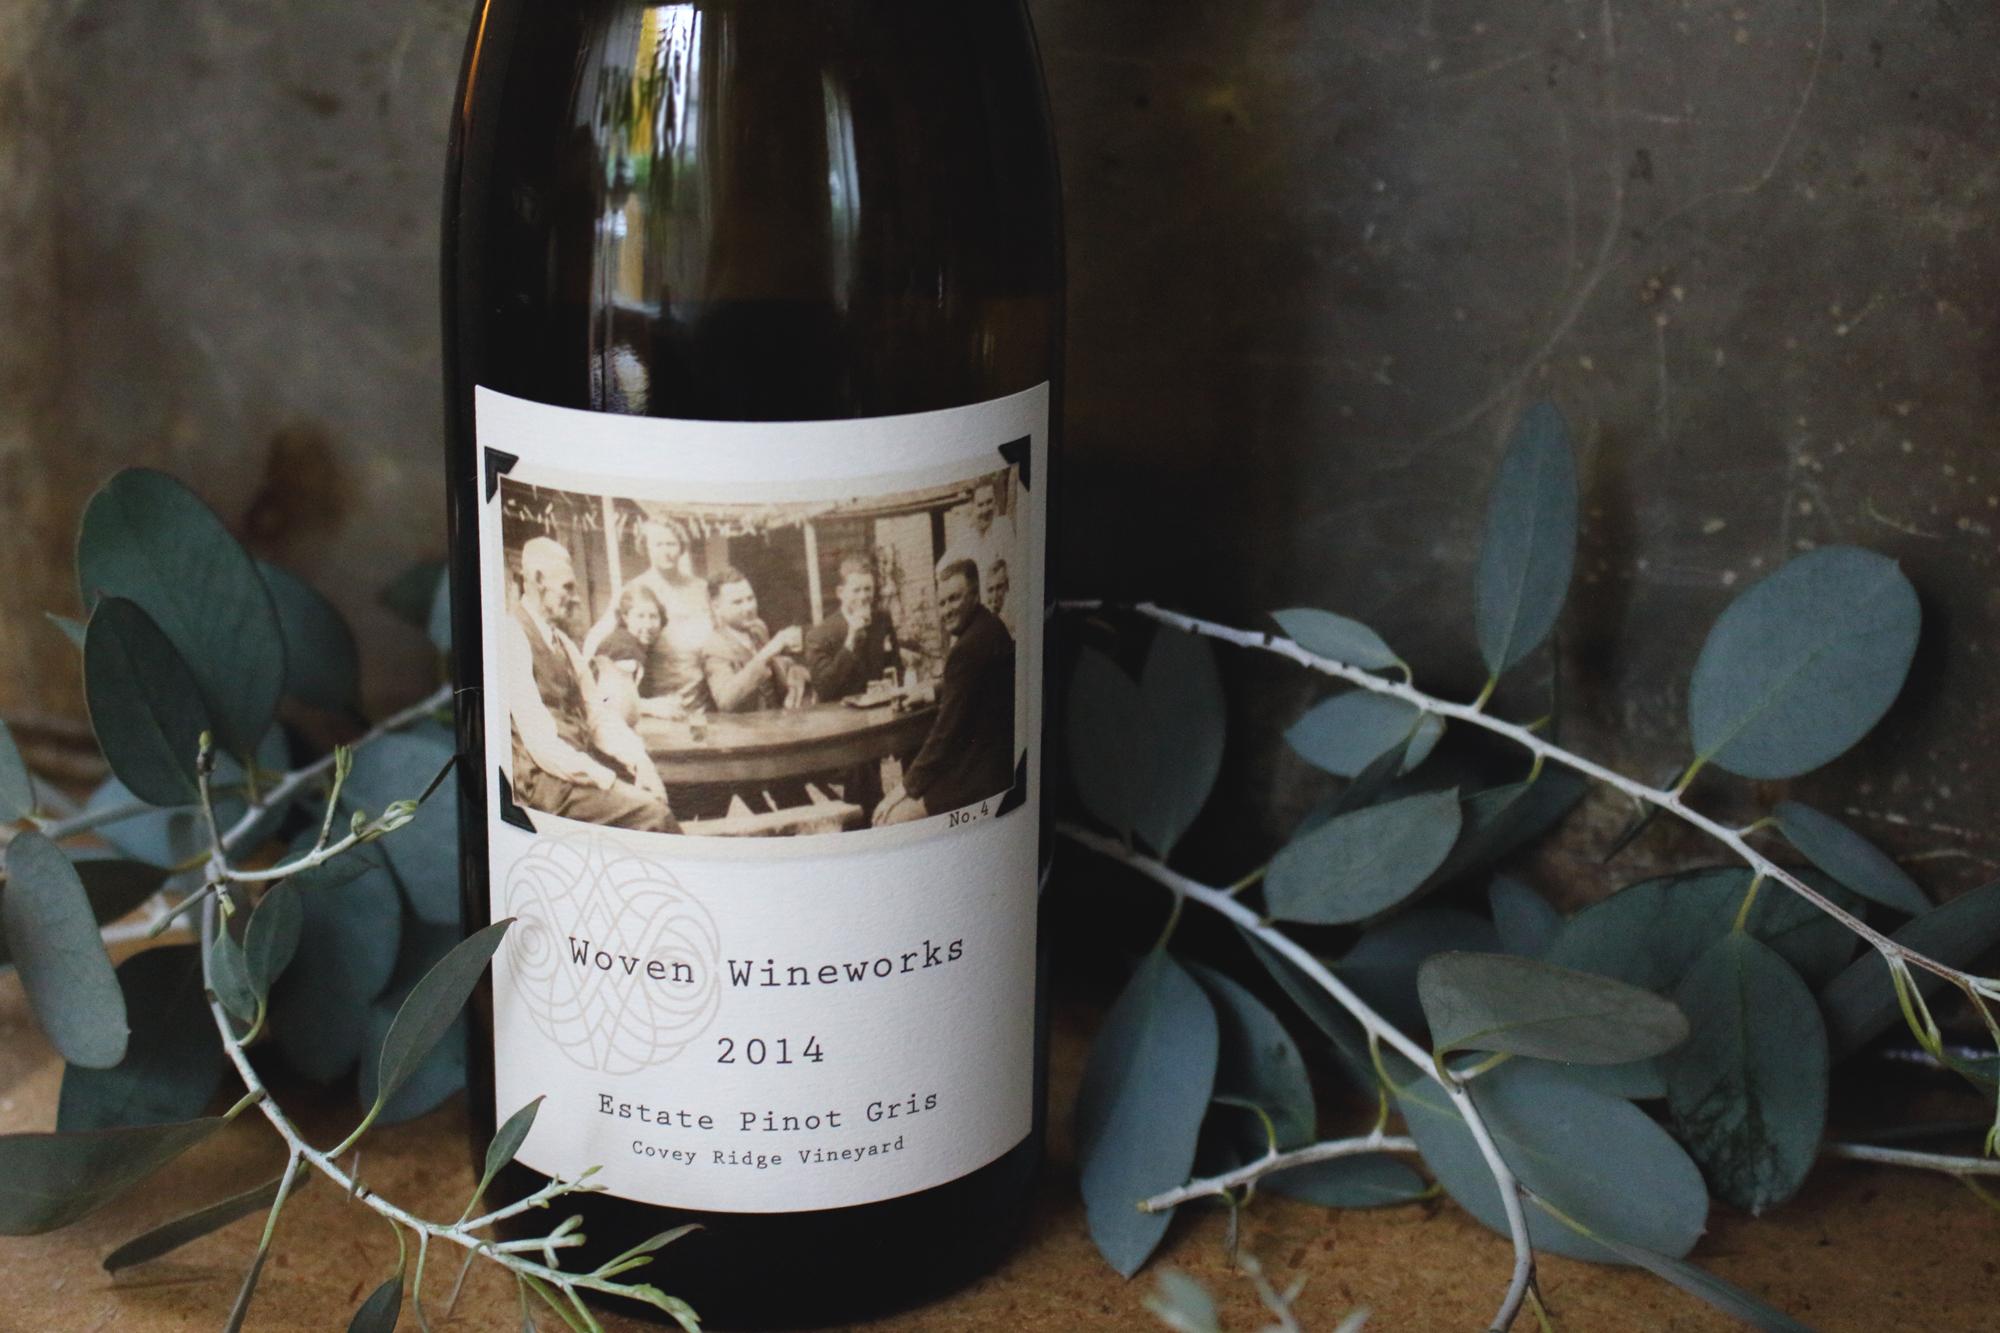 Woven Wineworks